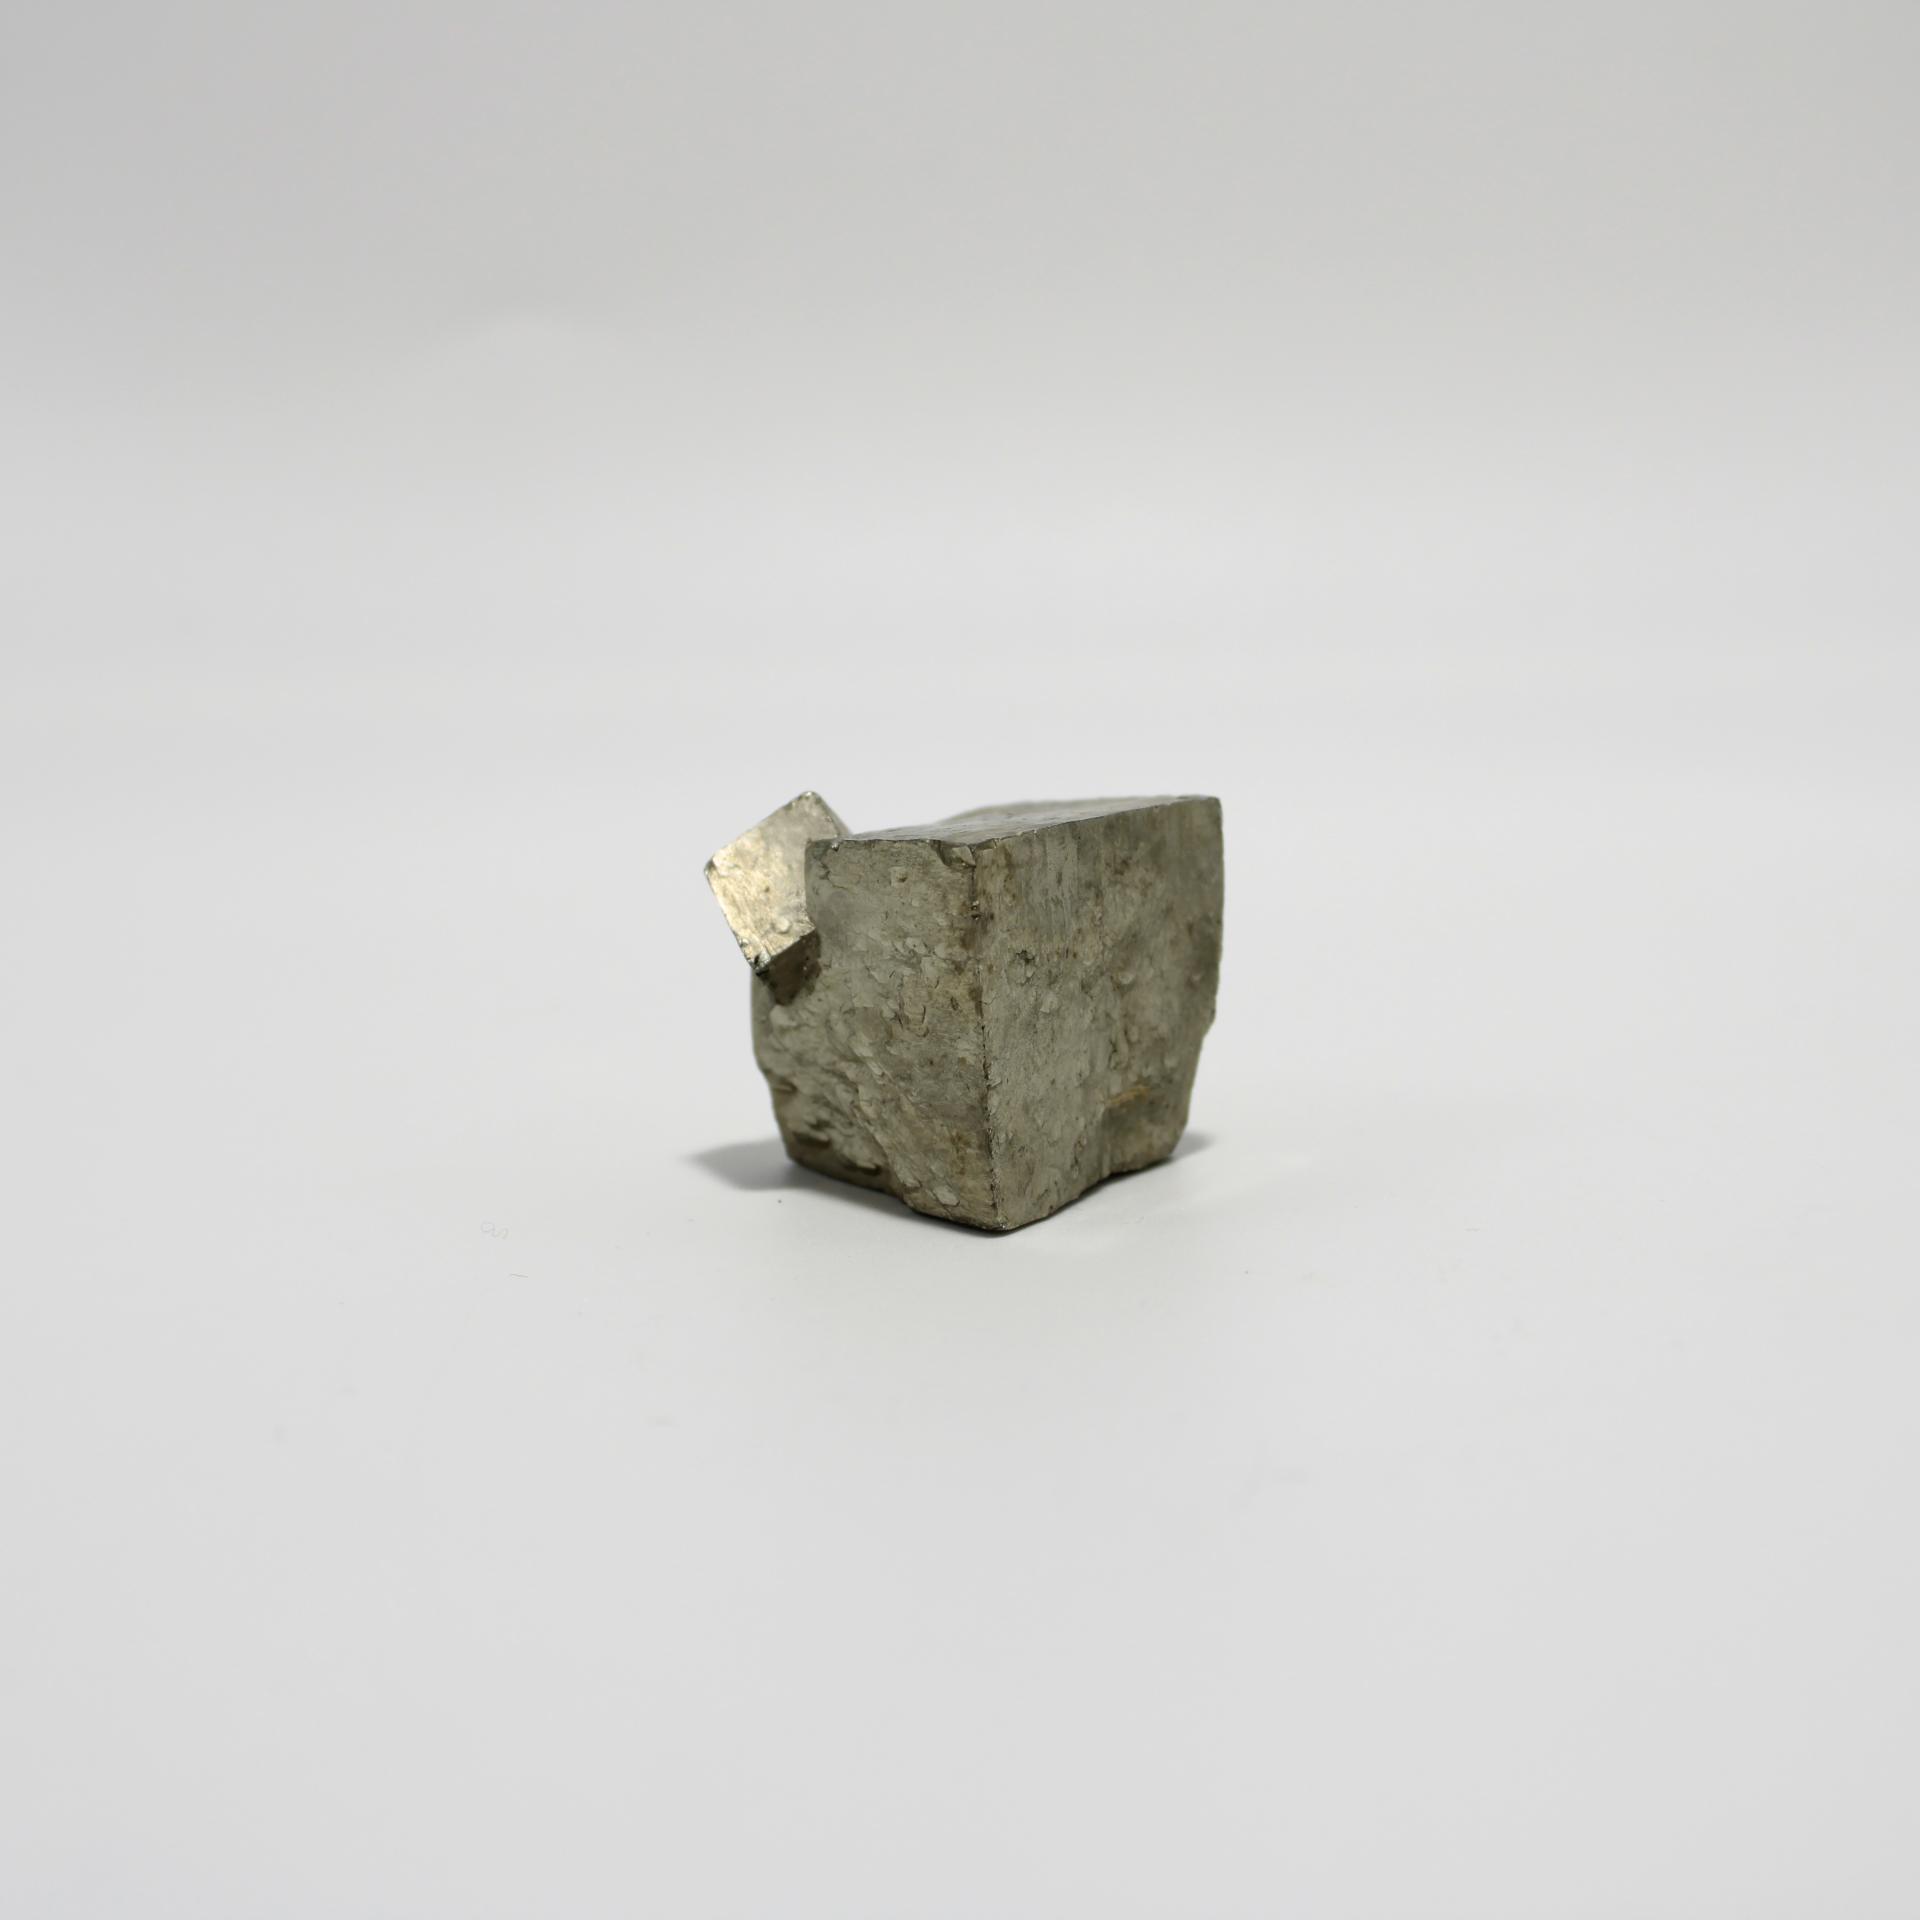 I82 pyritecube 7